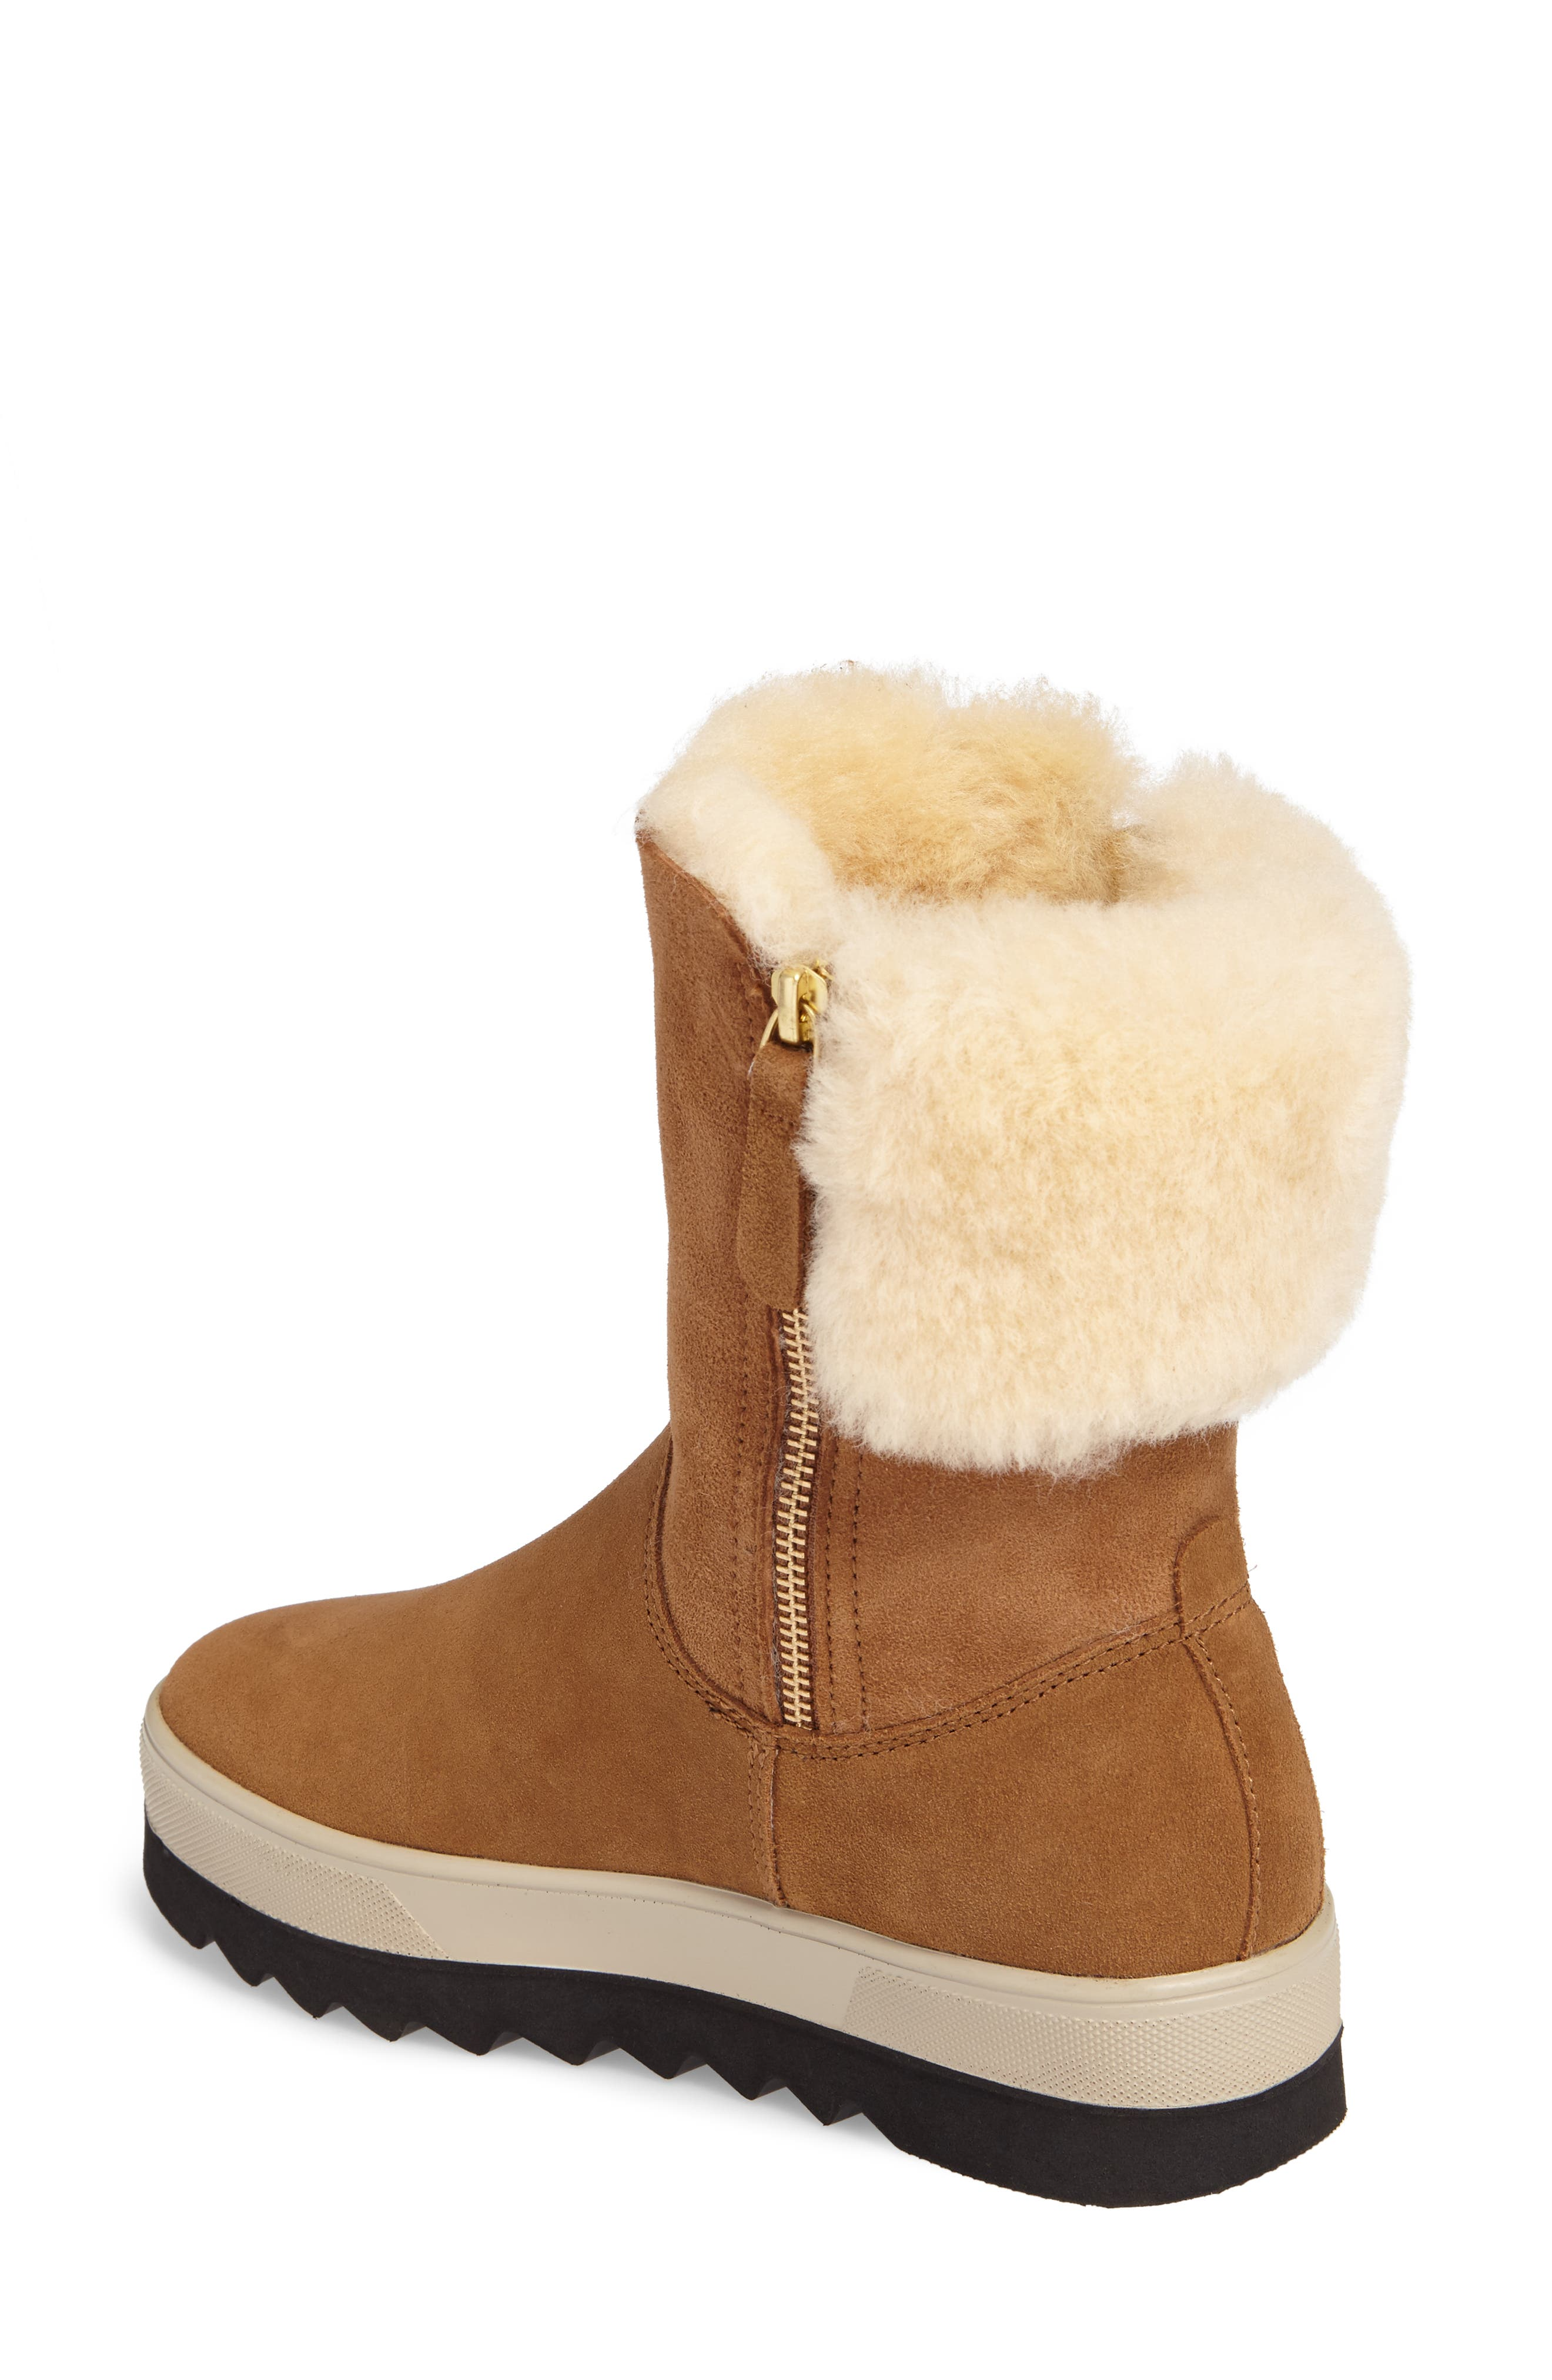 Alternate Image 2  - Cougar Vera Genuine Shearling Boot (Women)